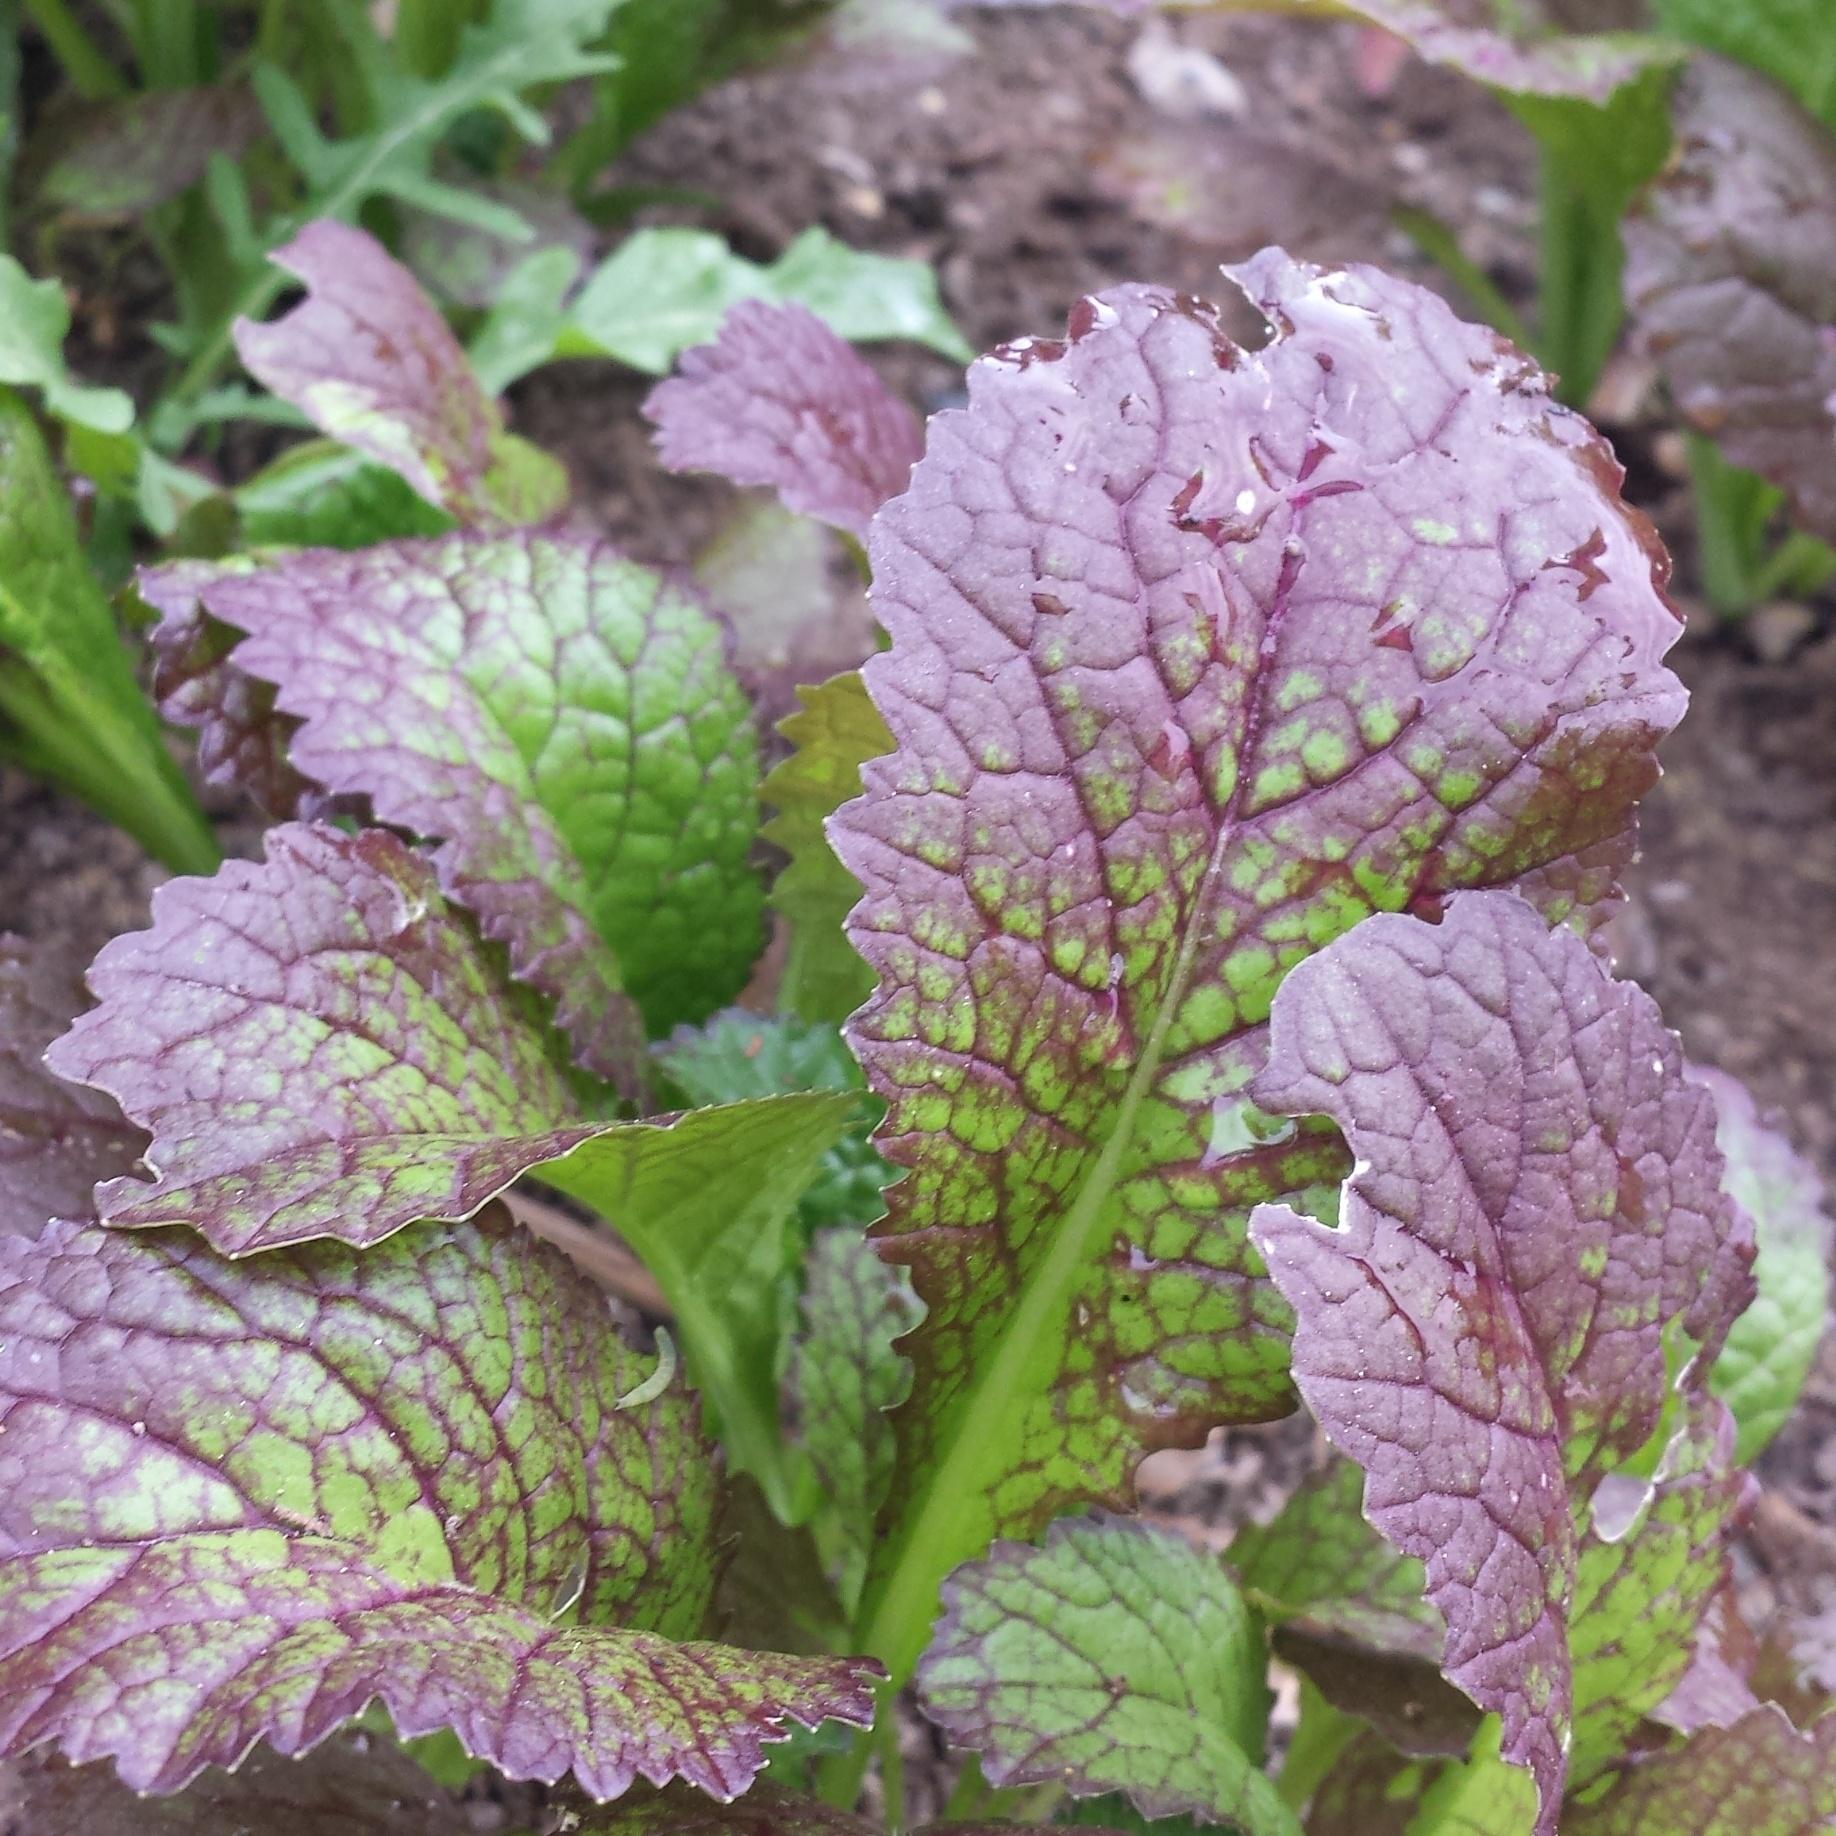 Arugula salad with fresh strawberries peas and walnuts yard sale mandoline - Growing french walnuts for a profit ...